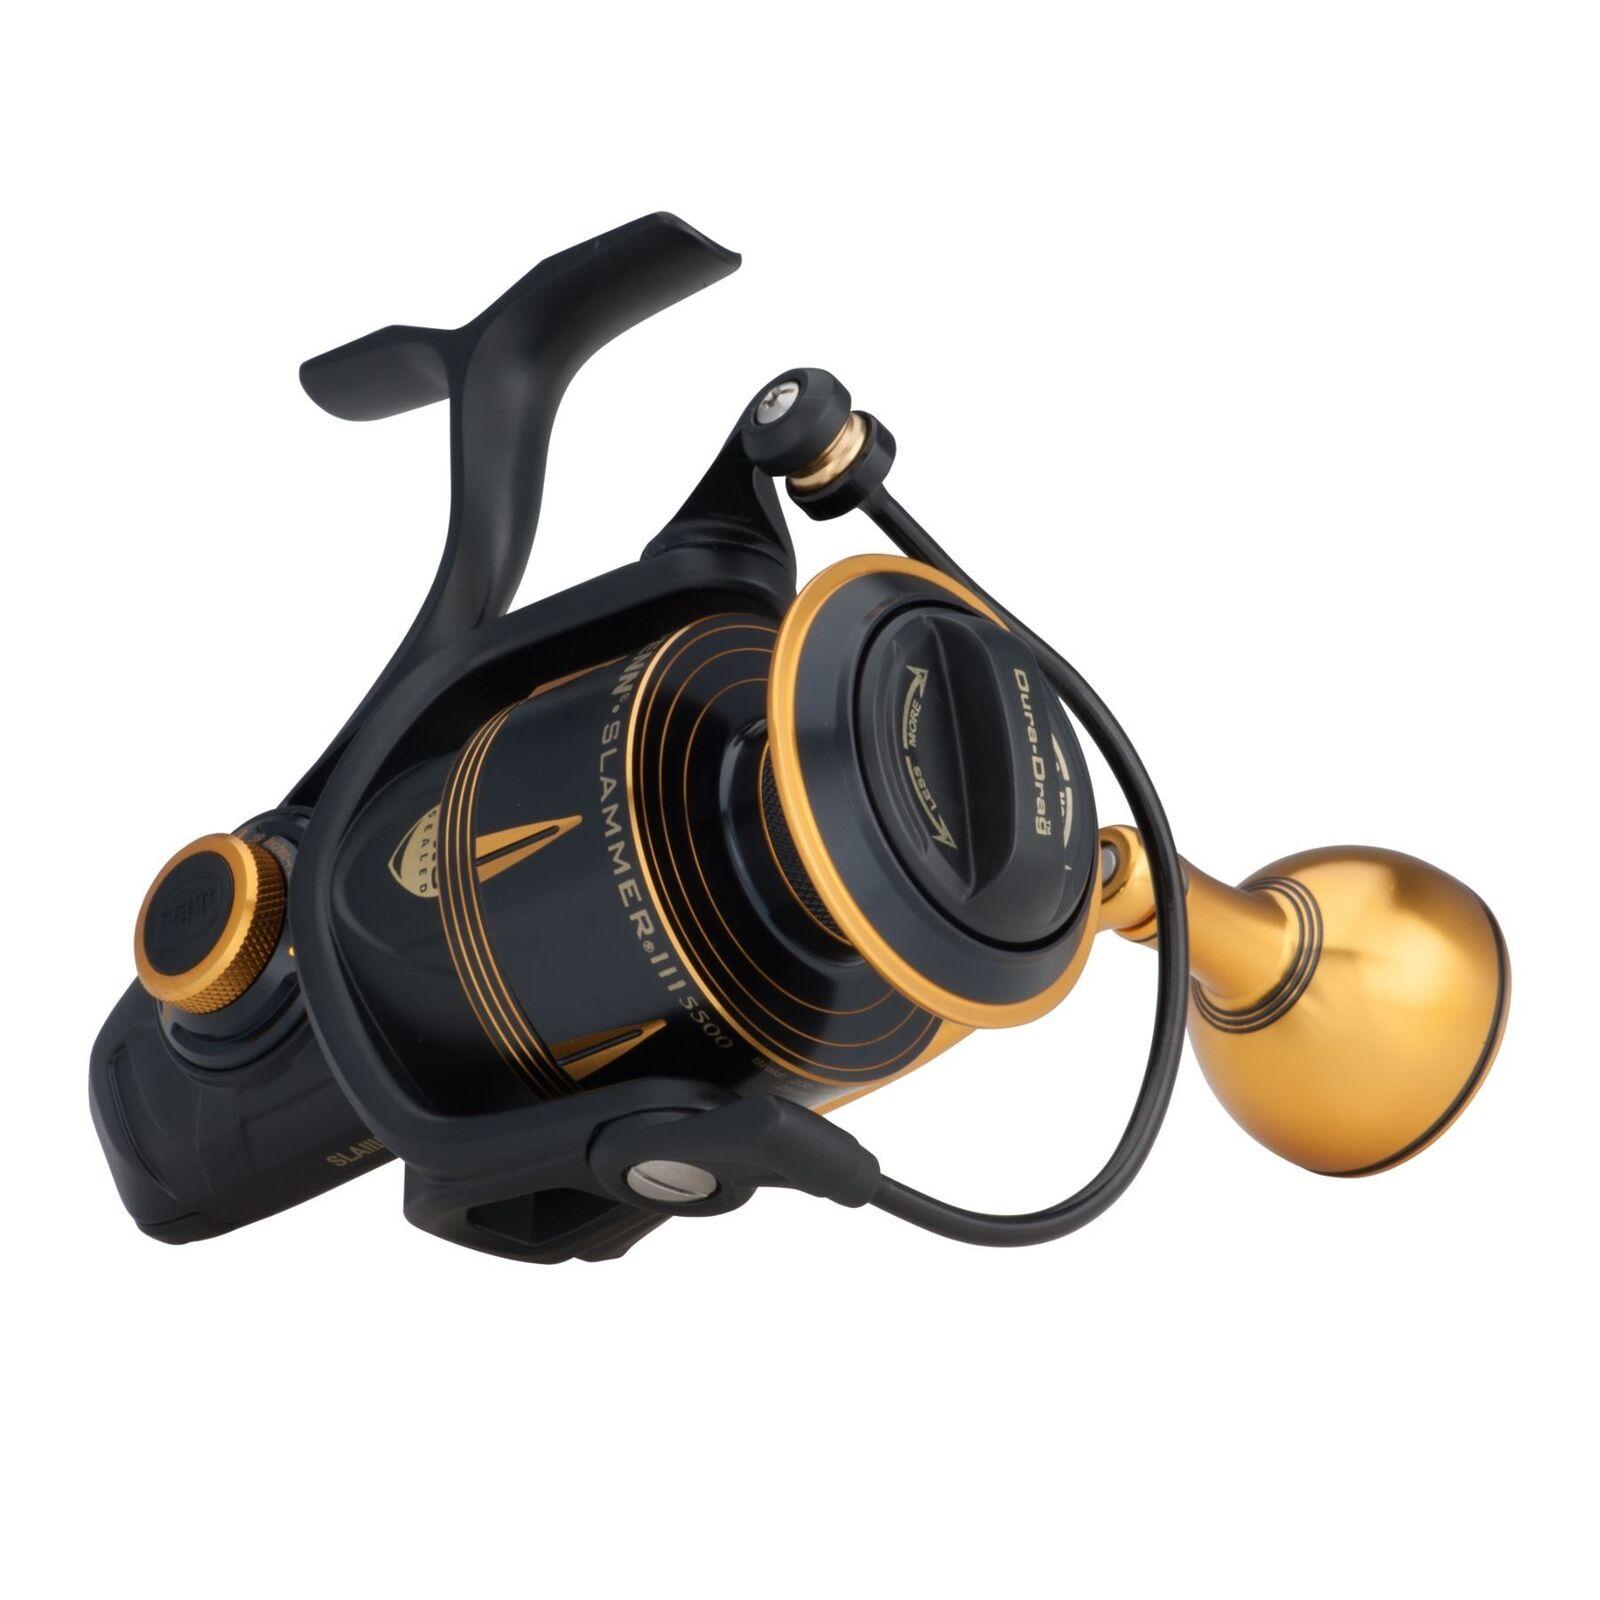 Penn Slammer III 5500   Resistente Mulinello per Pesca Spinning